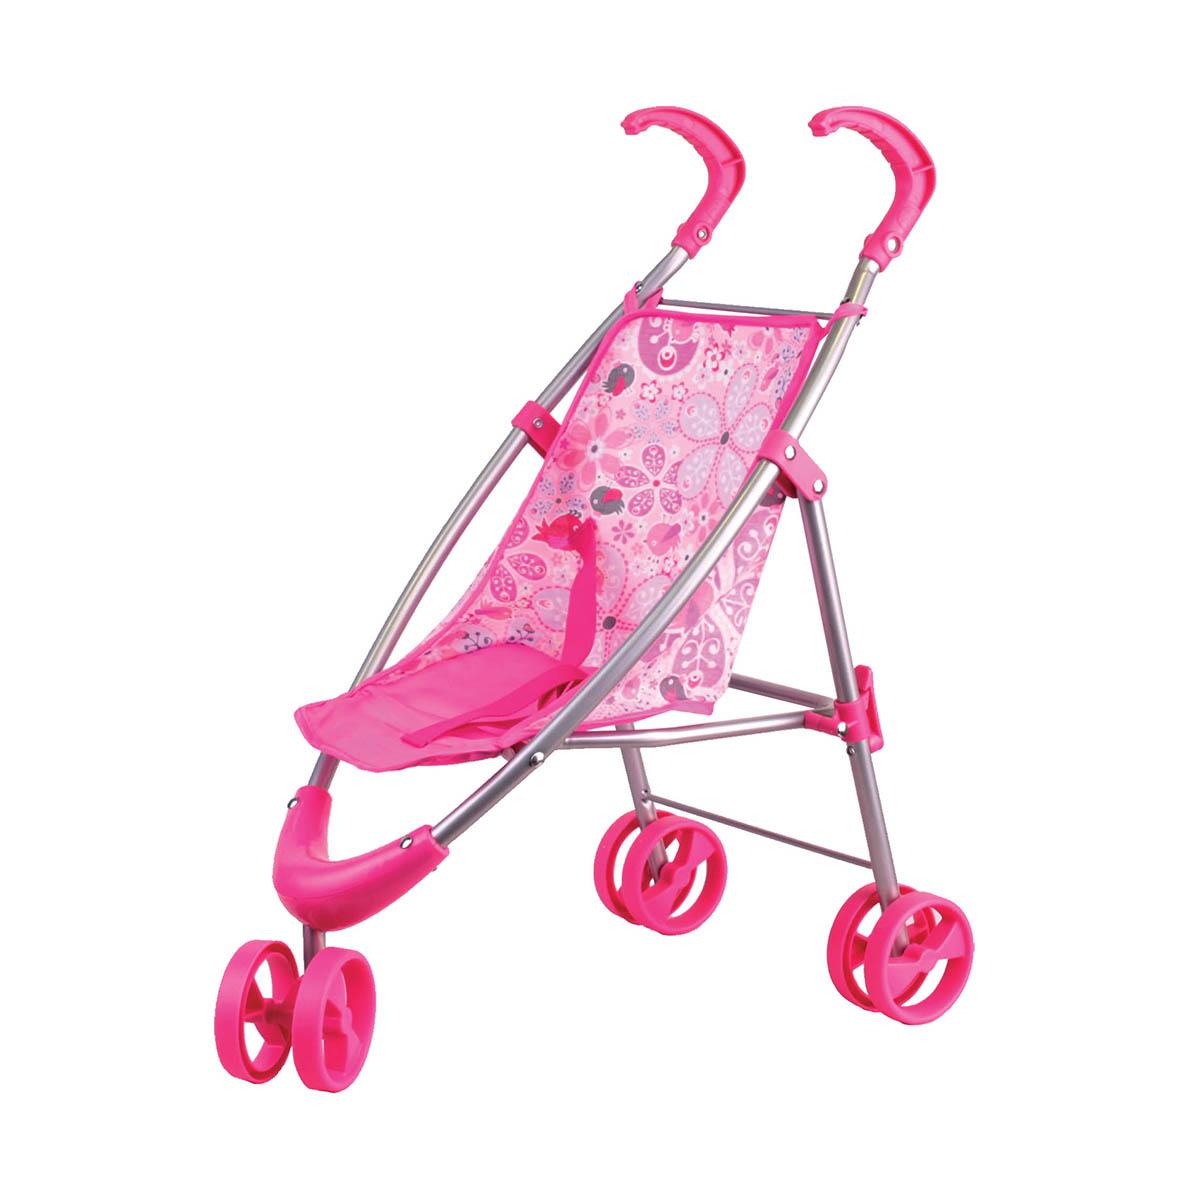 Прогулочная коляска розоваяКоляски для кукол<br>Прогулочная коляска розовая<br>